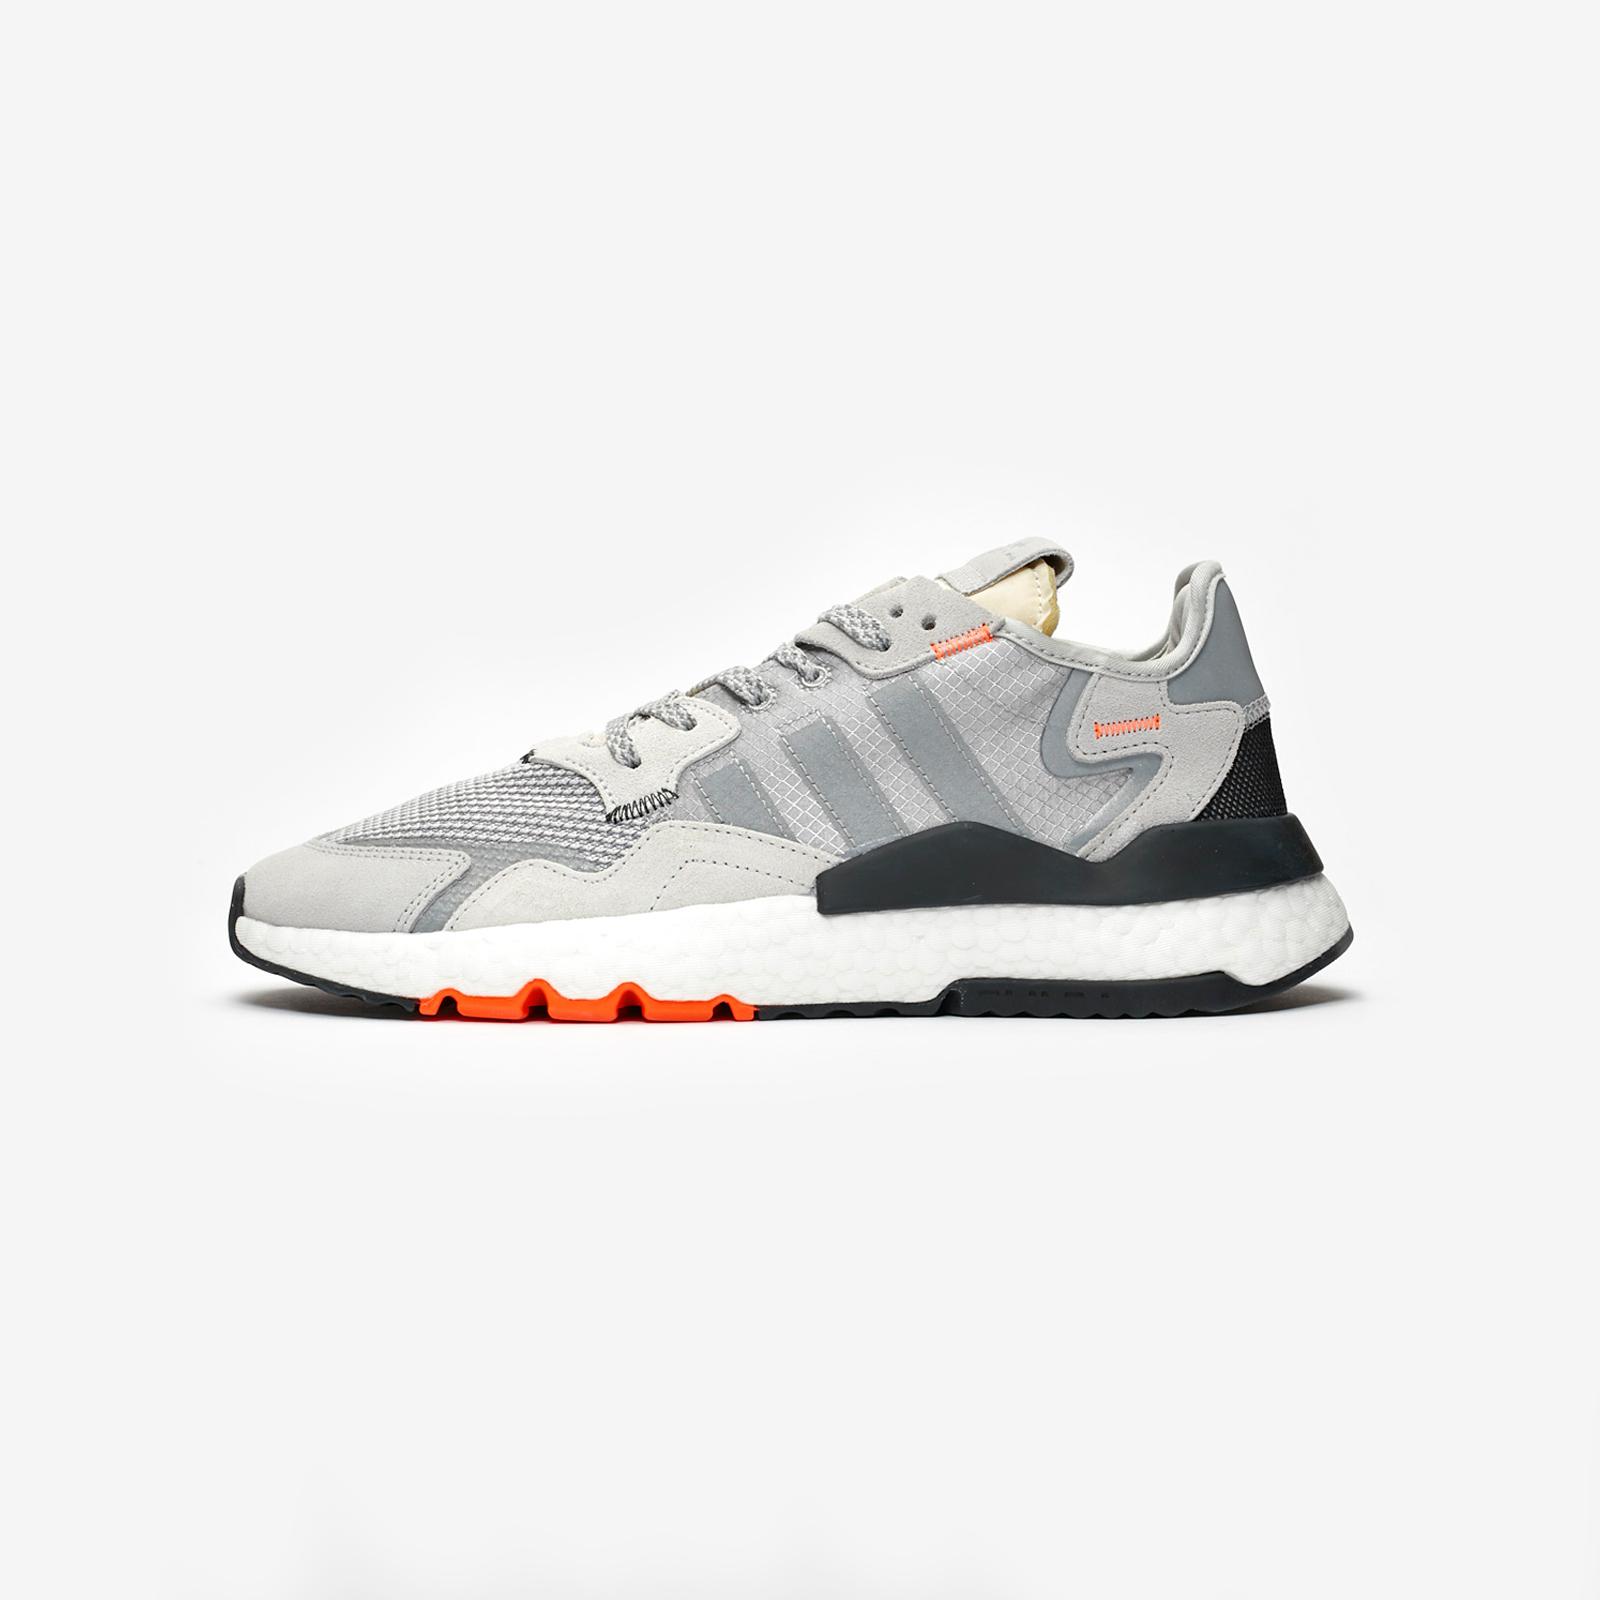 f5fa5abf731 adidas Nite Jogger - Db3361 - Sneakersnstuff   sneakers & streetwear online  since 1999